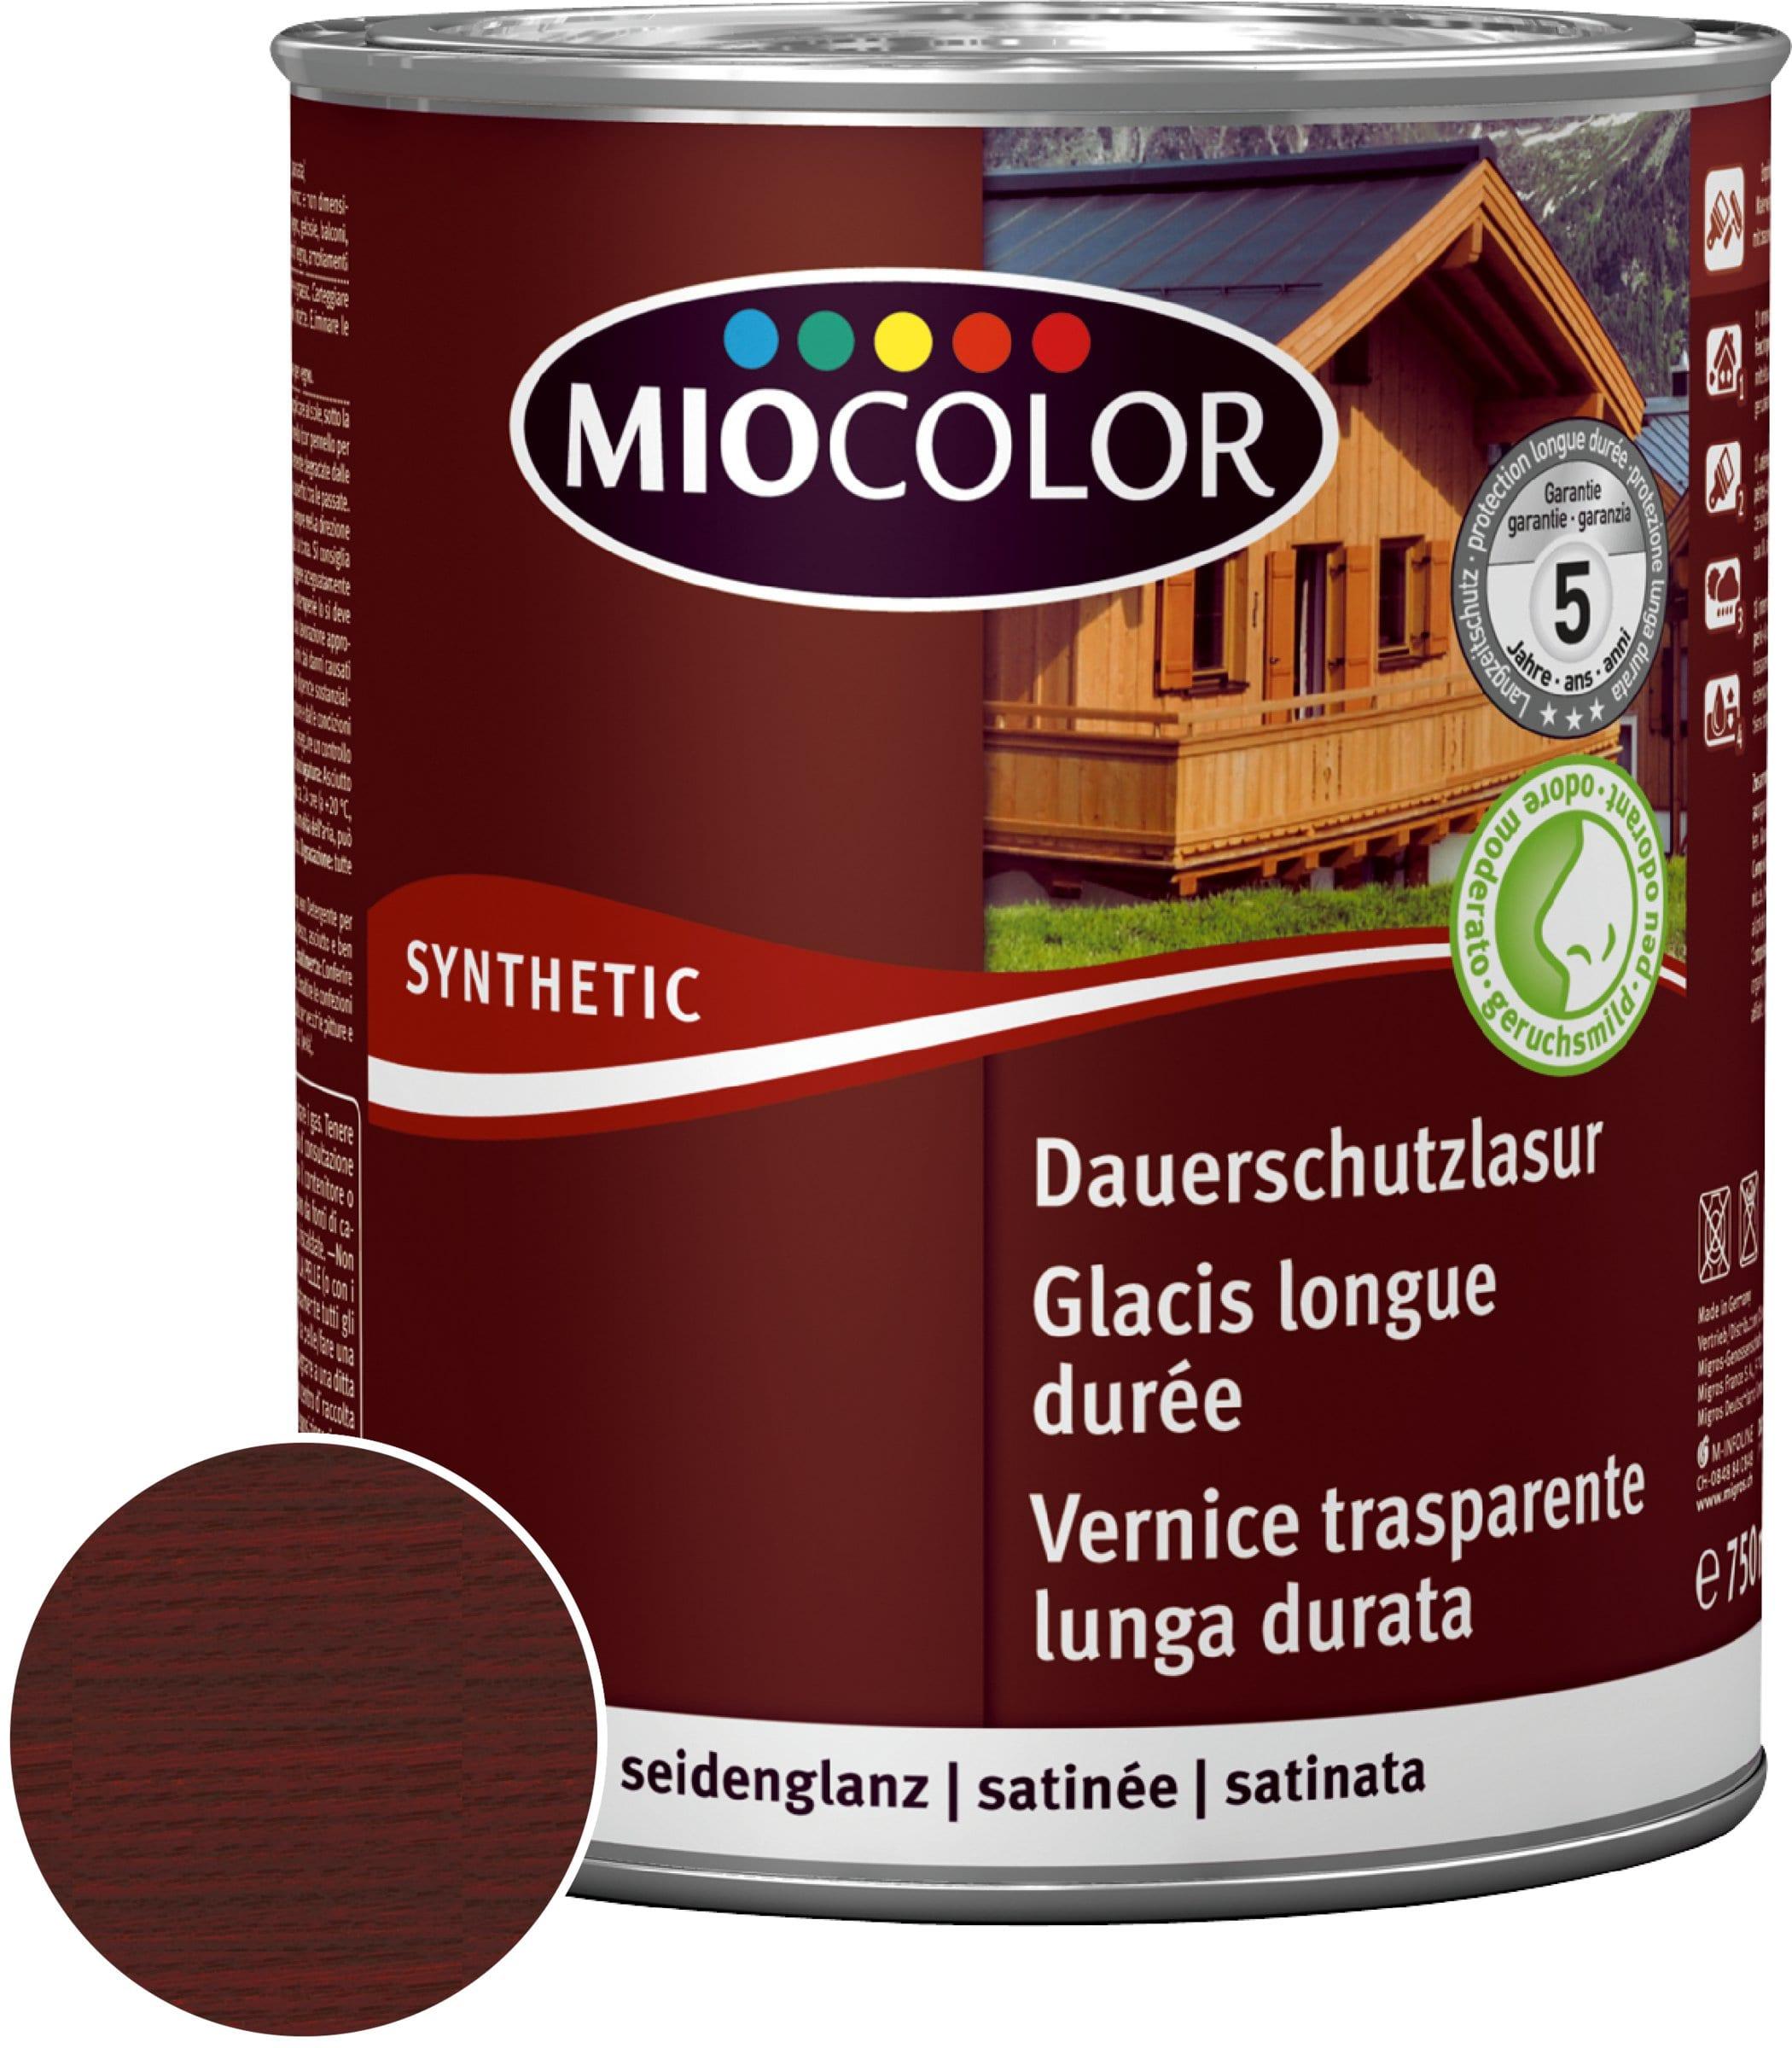 Miocolor Vernice trasparente lunga durata Palissandro 750 ml